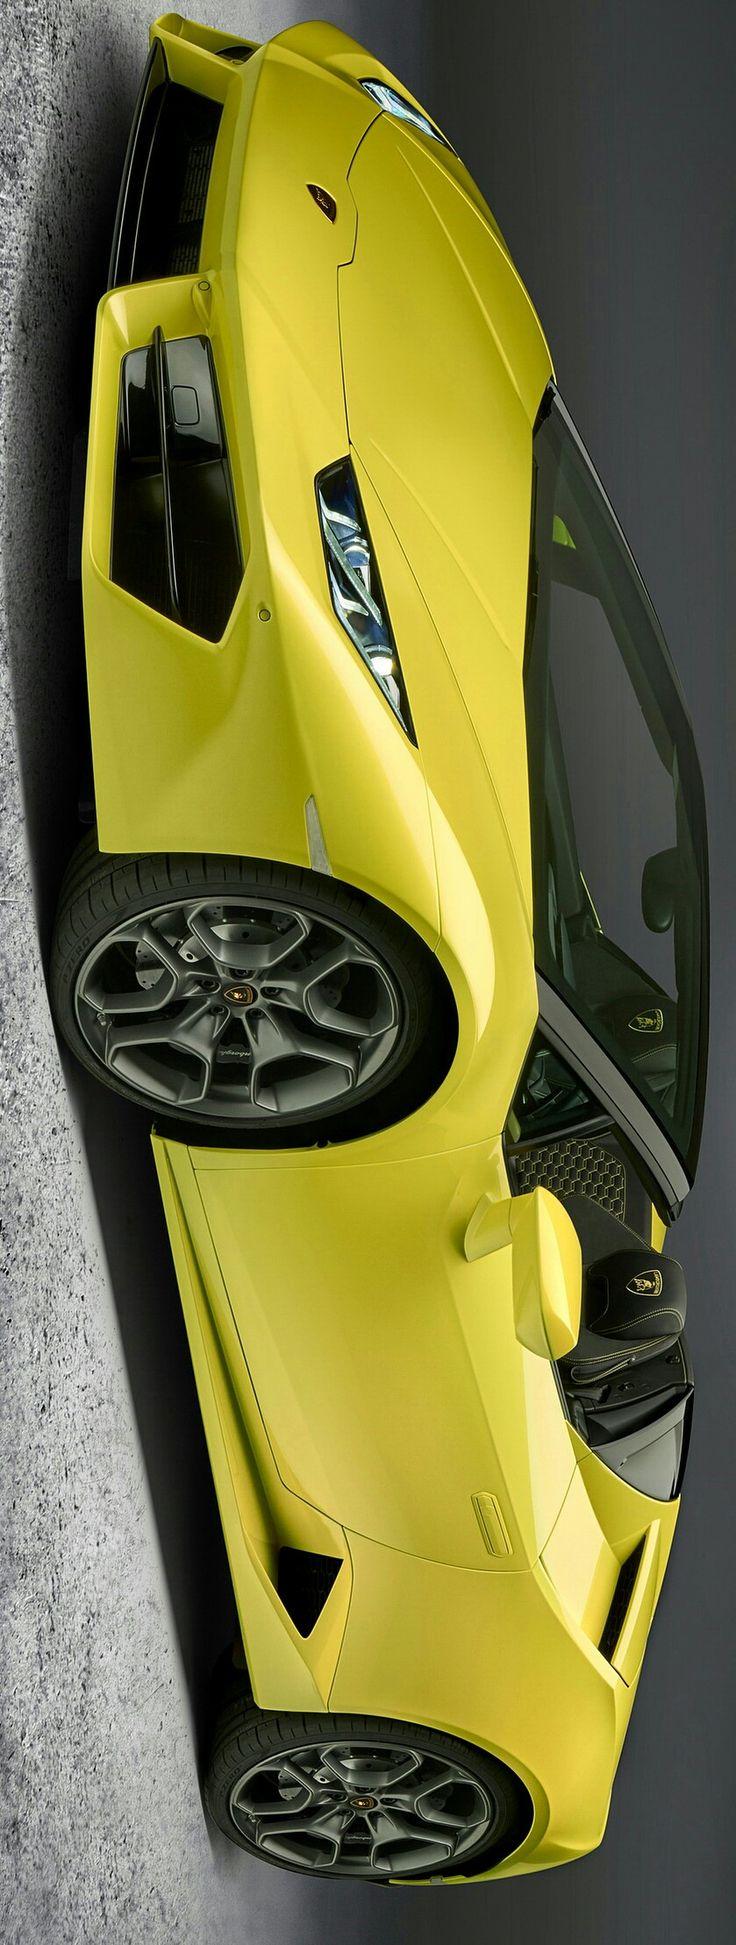 2017 Lamborghini Huracan Spyder RWD by Levon